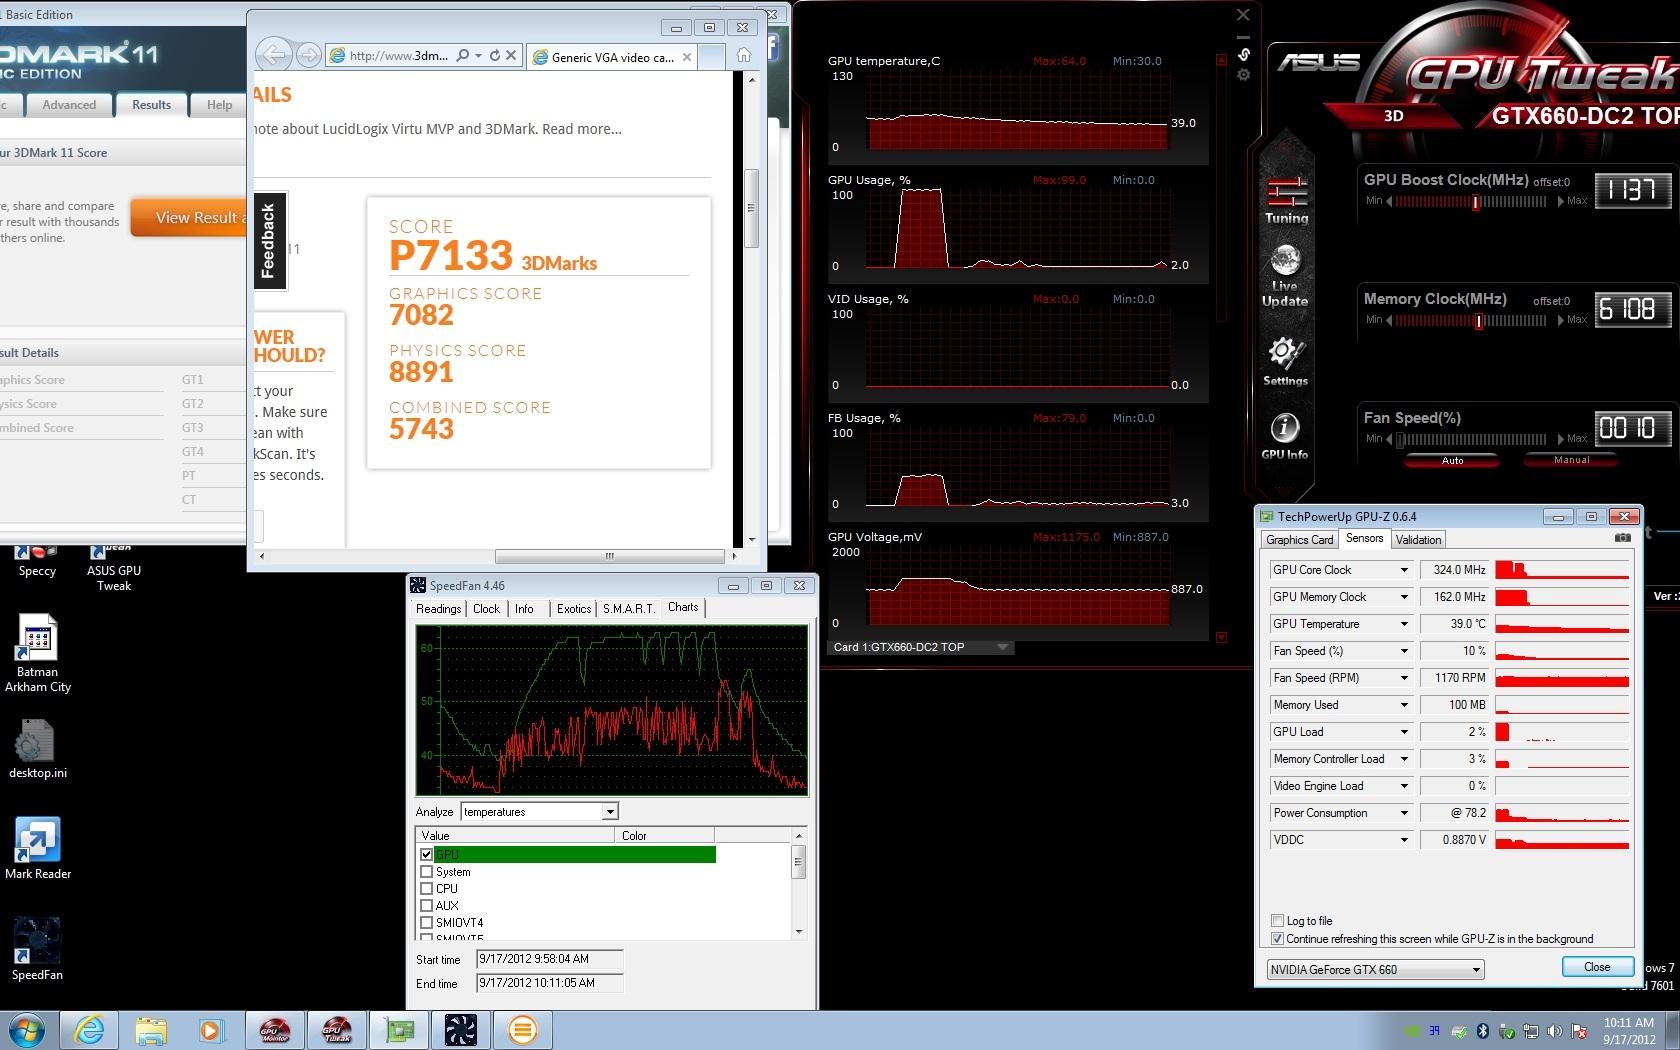 ASUS GeForce GTX 660 DirectCU II TOP Video Card Review